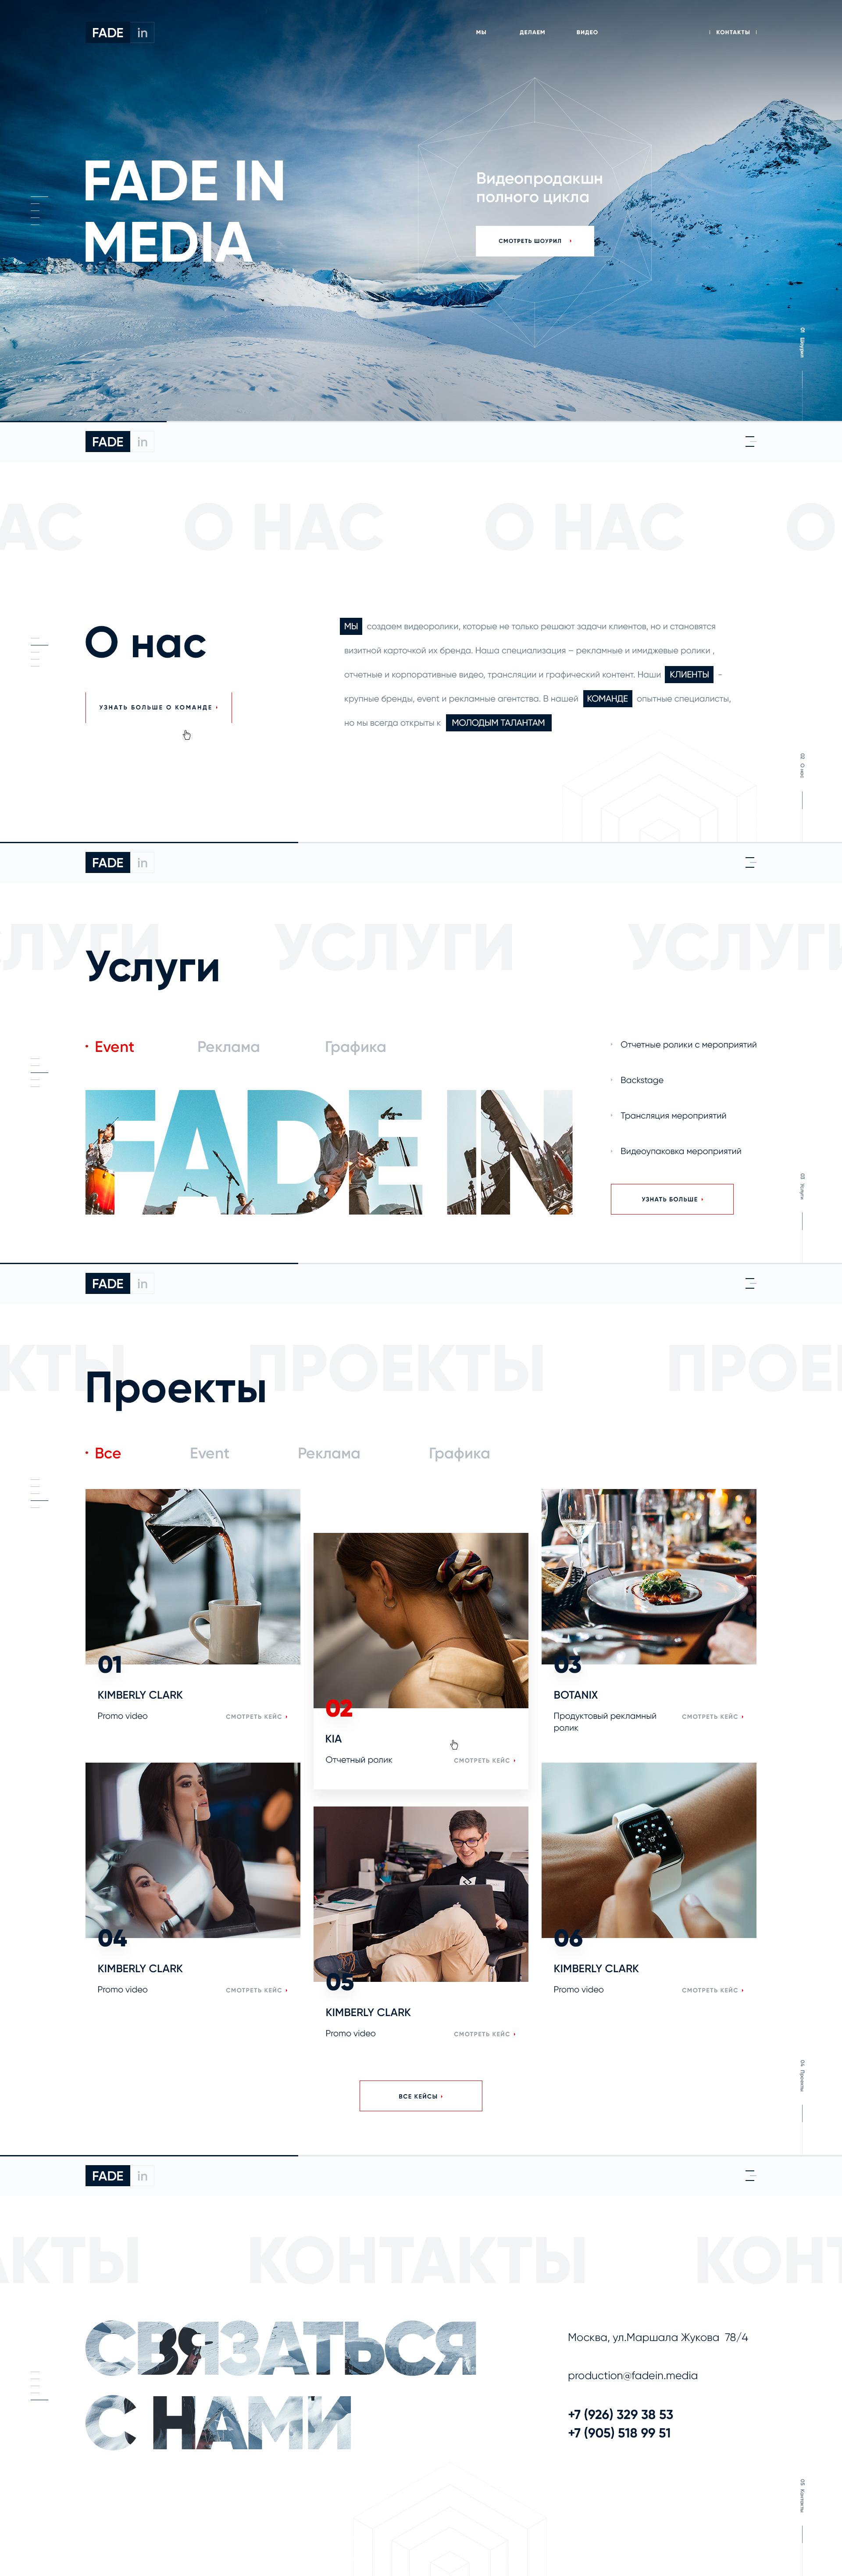 Fade in media (corporate)